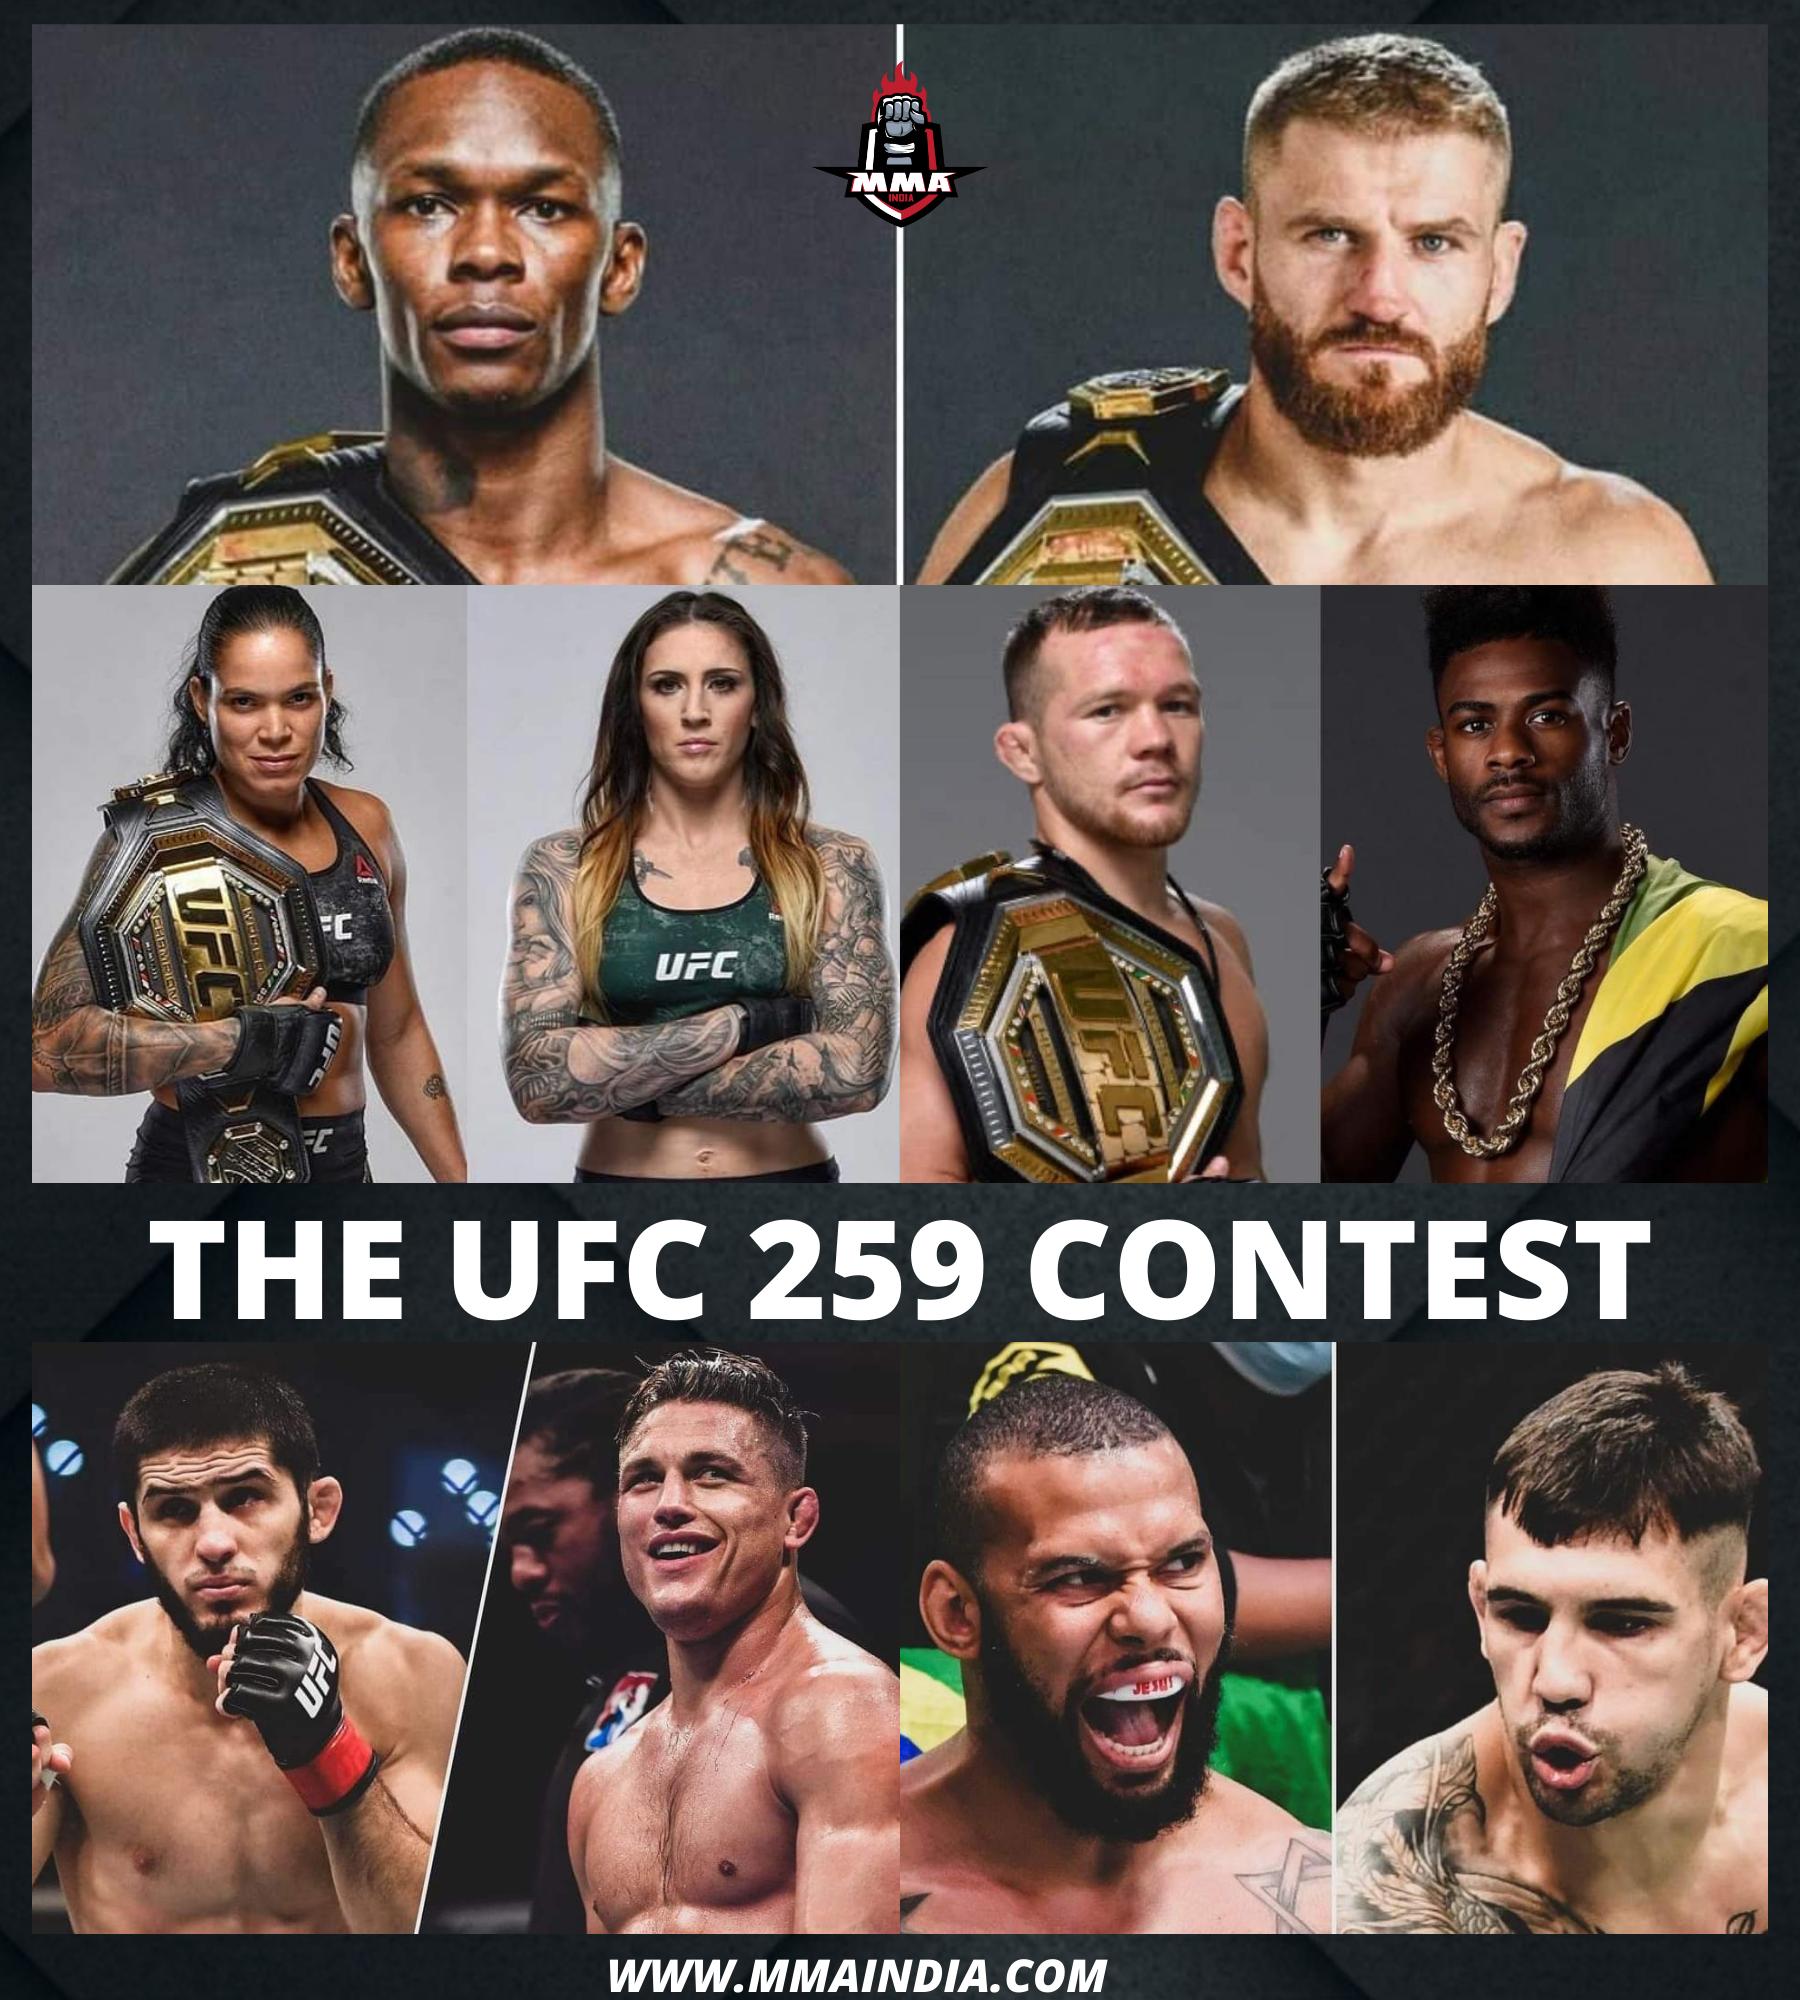 THE UFC 259 CONTEST | MMA INDIA SHOW - UFC 259